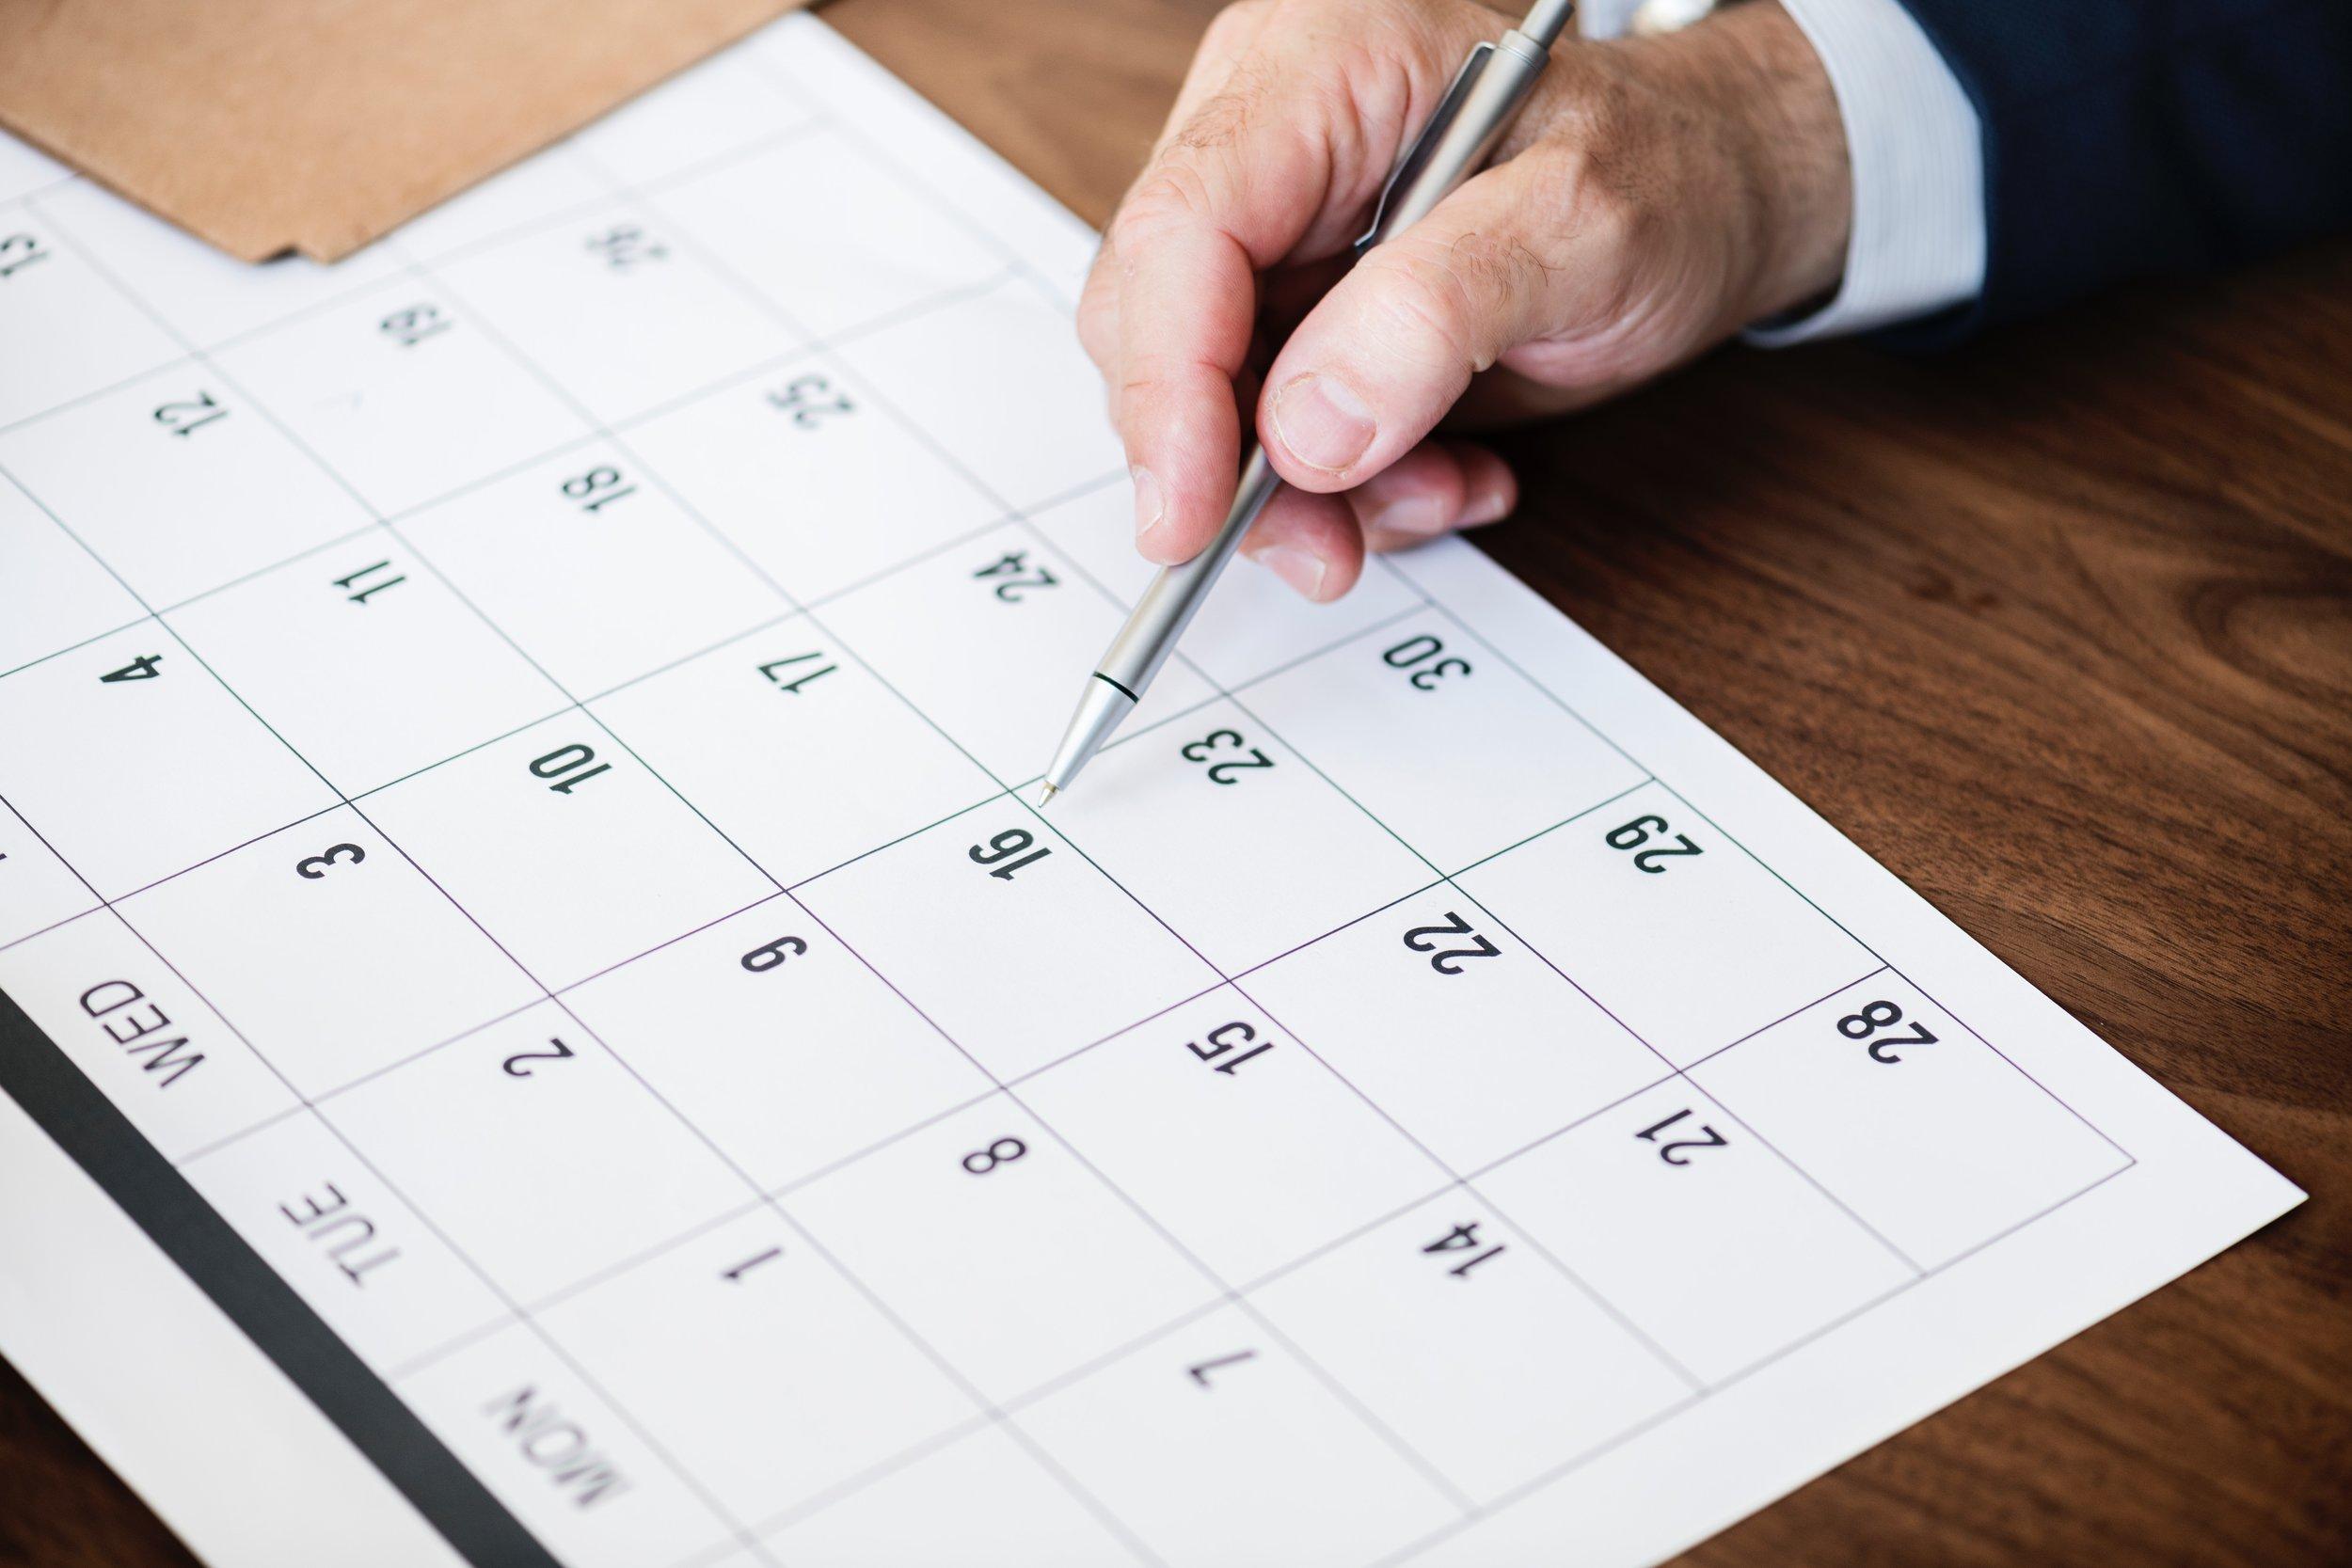 calendar-close-up-dates-862731.jpg